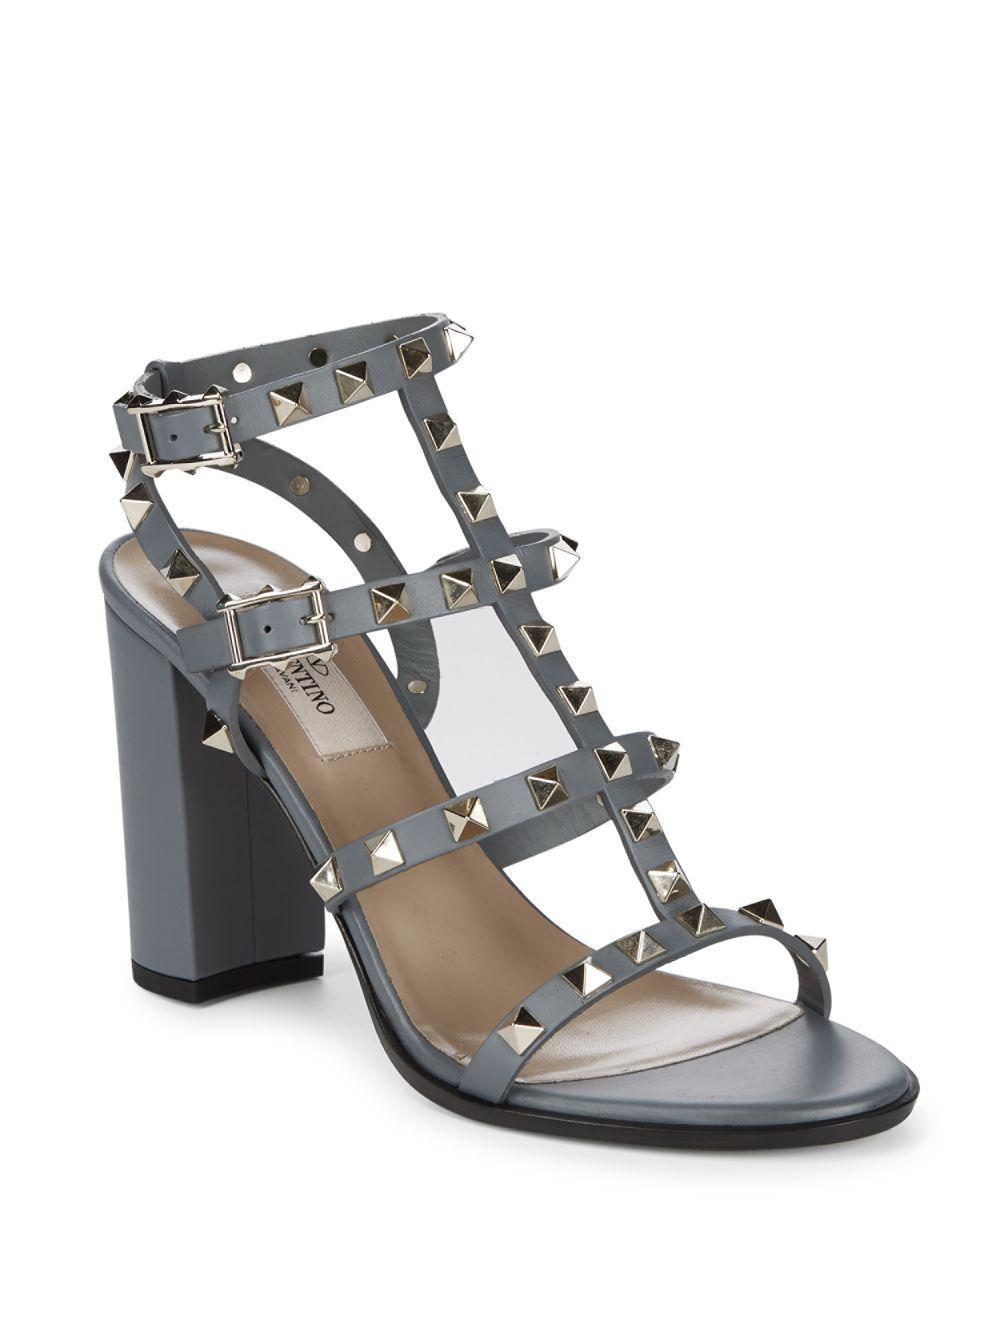 52384f76089 Lyst - Valentino Gladiator Block Heel Sandals in Gray